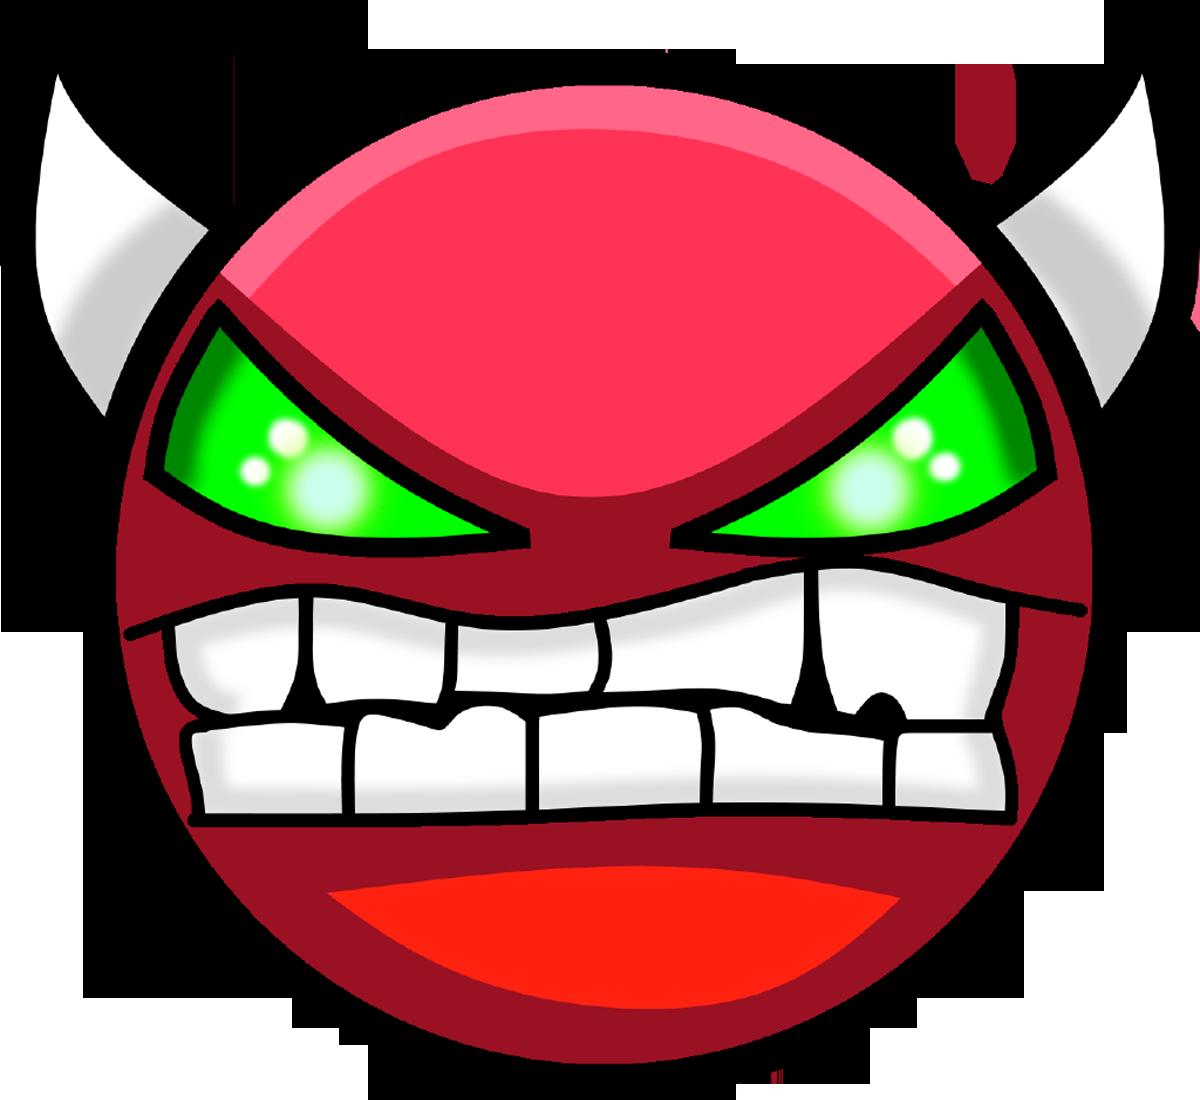 Файл:Demon.png